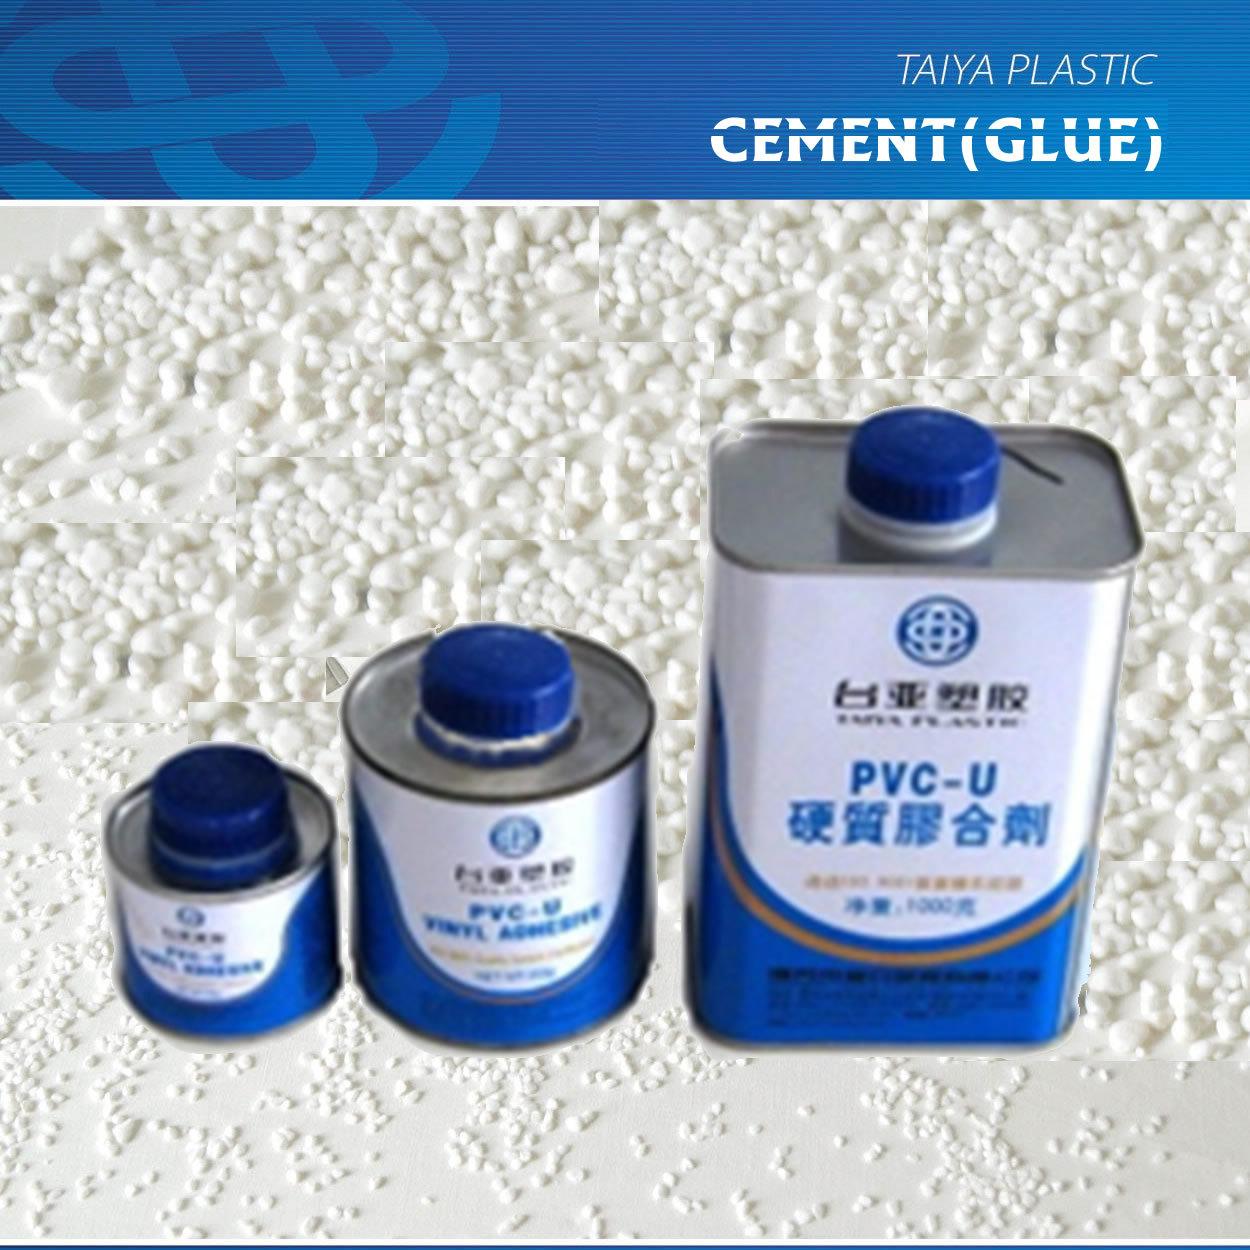 Pvc Solvent Cement : China pvc solvent cement glue